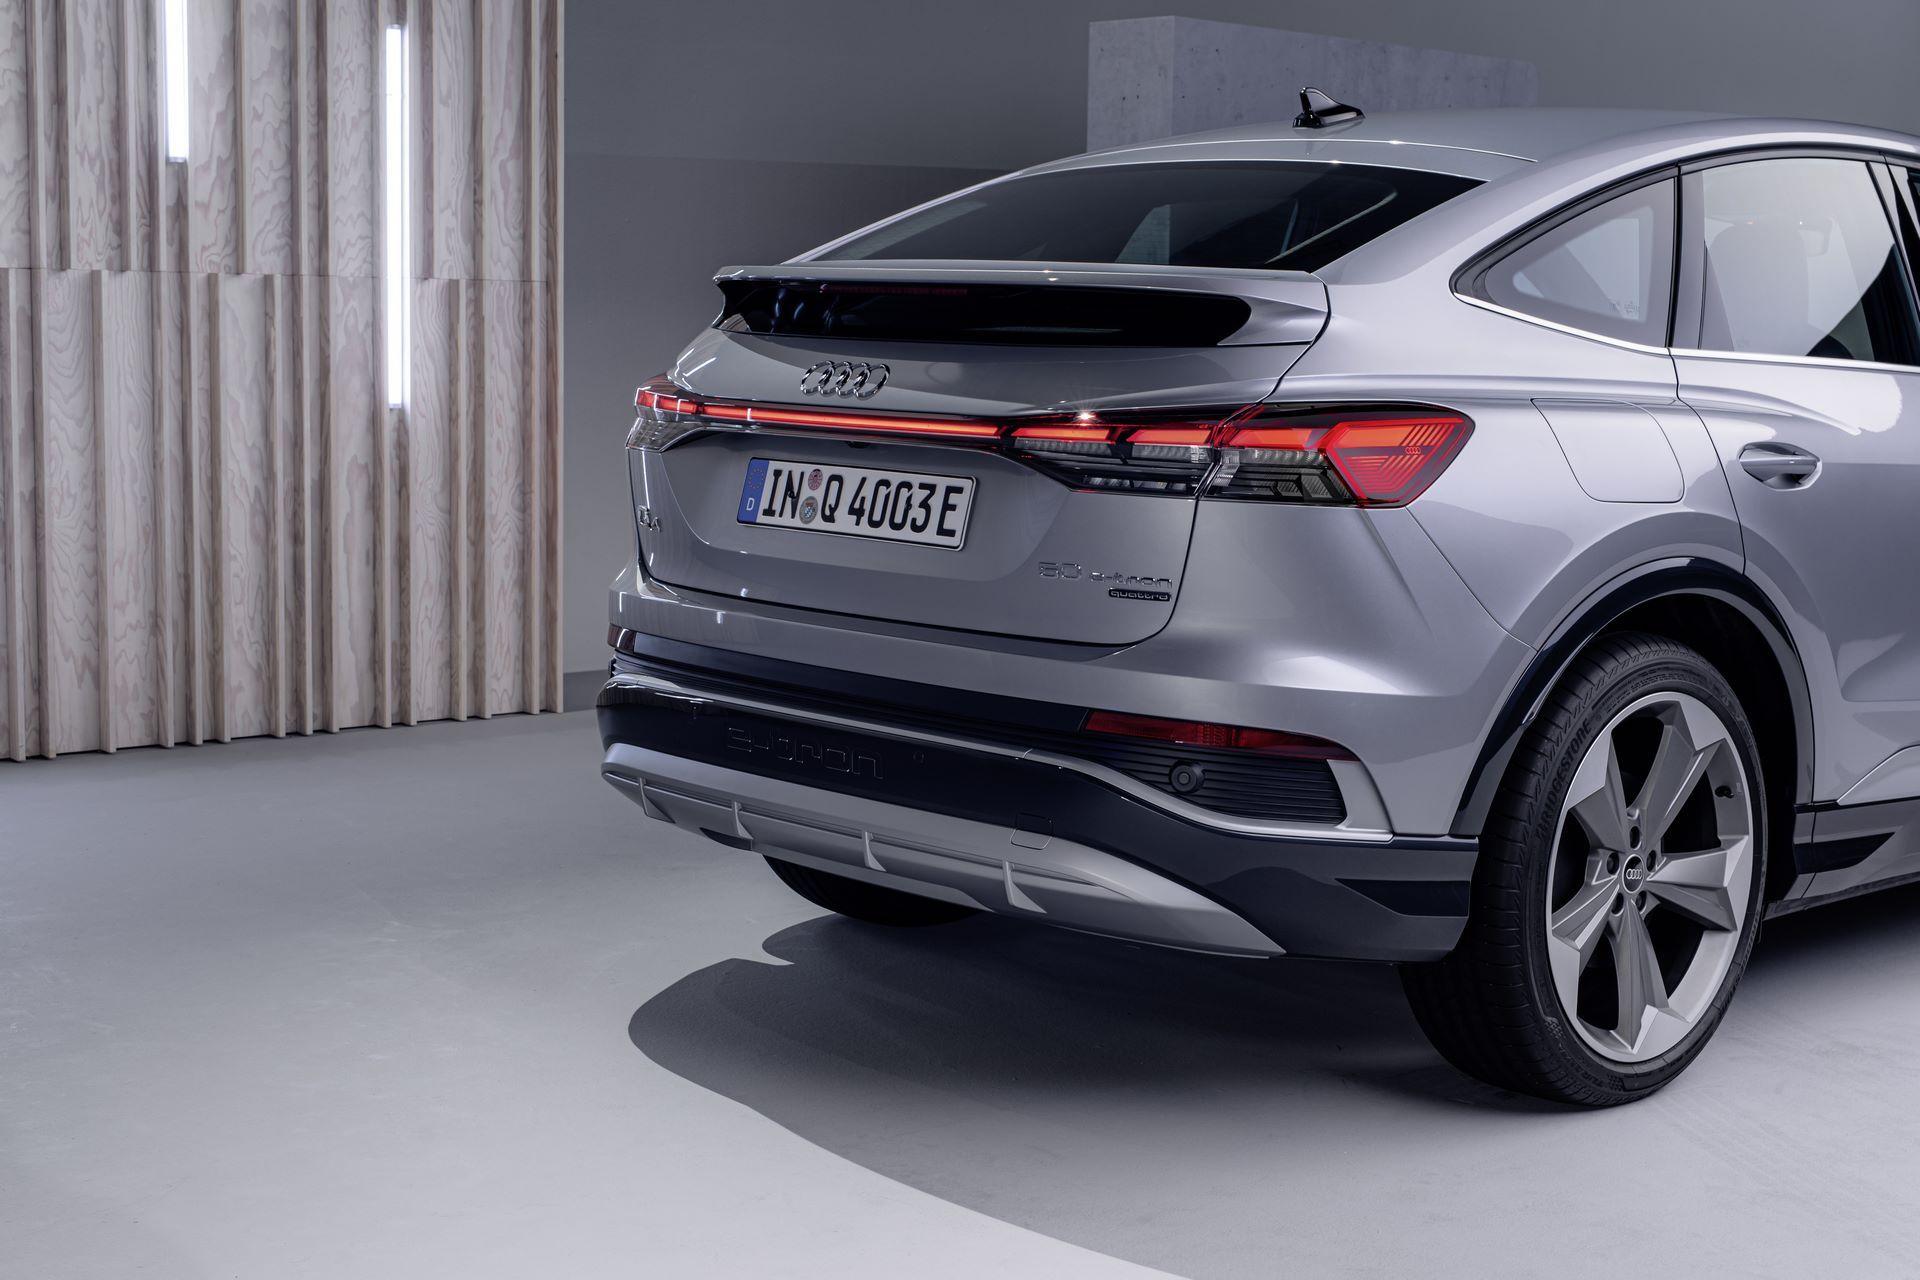 Audi-Q4-e-tron-and-Q4-e-tron-Sportback-165